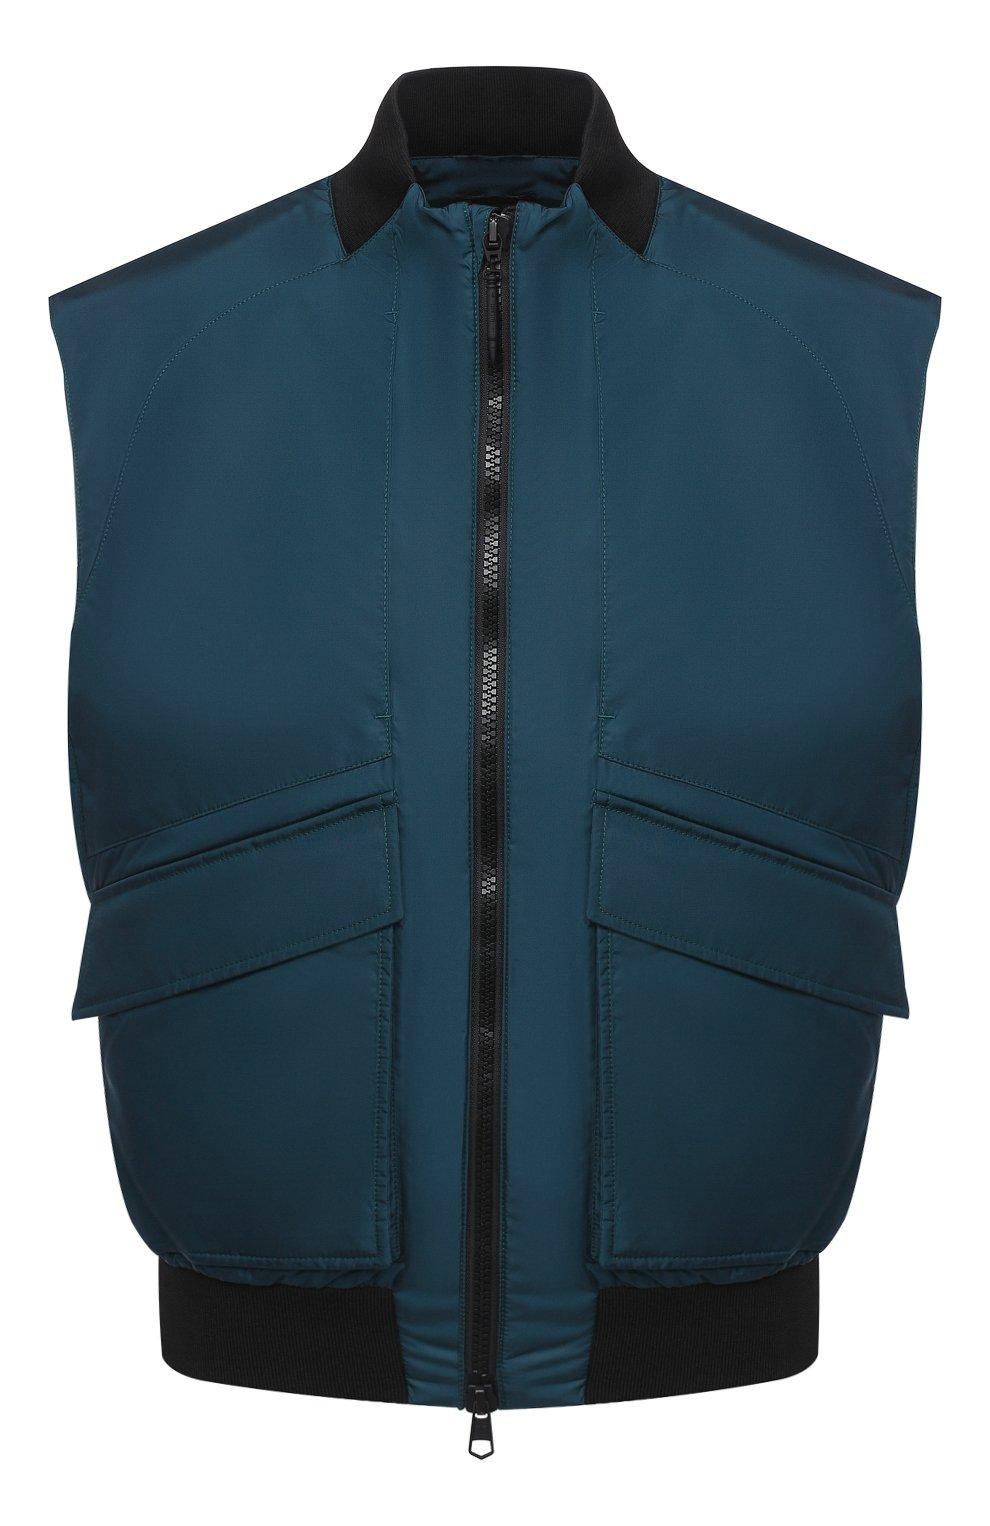 Мужской жилет CROW'S EYE темно-бирюзового цвета, арт. LE 65   Фото 1 (Кросс-КТ: Куртка; Материал внешний: Синтетический материал; Стили: Спорт-шик; Материал подклада: Синтетический материал; Мужское Кросс-КТ: Верхняя одежда; Длина (верхняя одежда): Короткие)